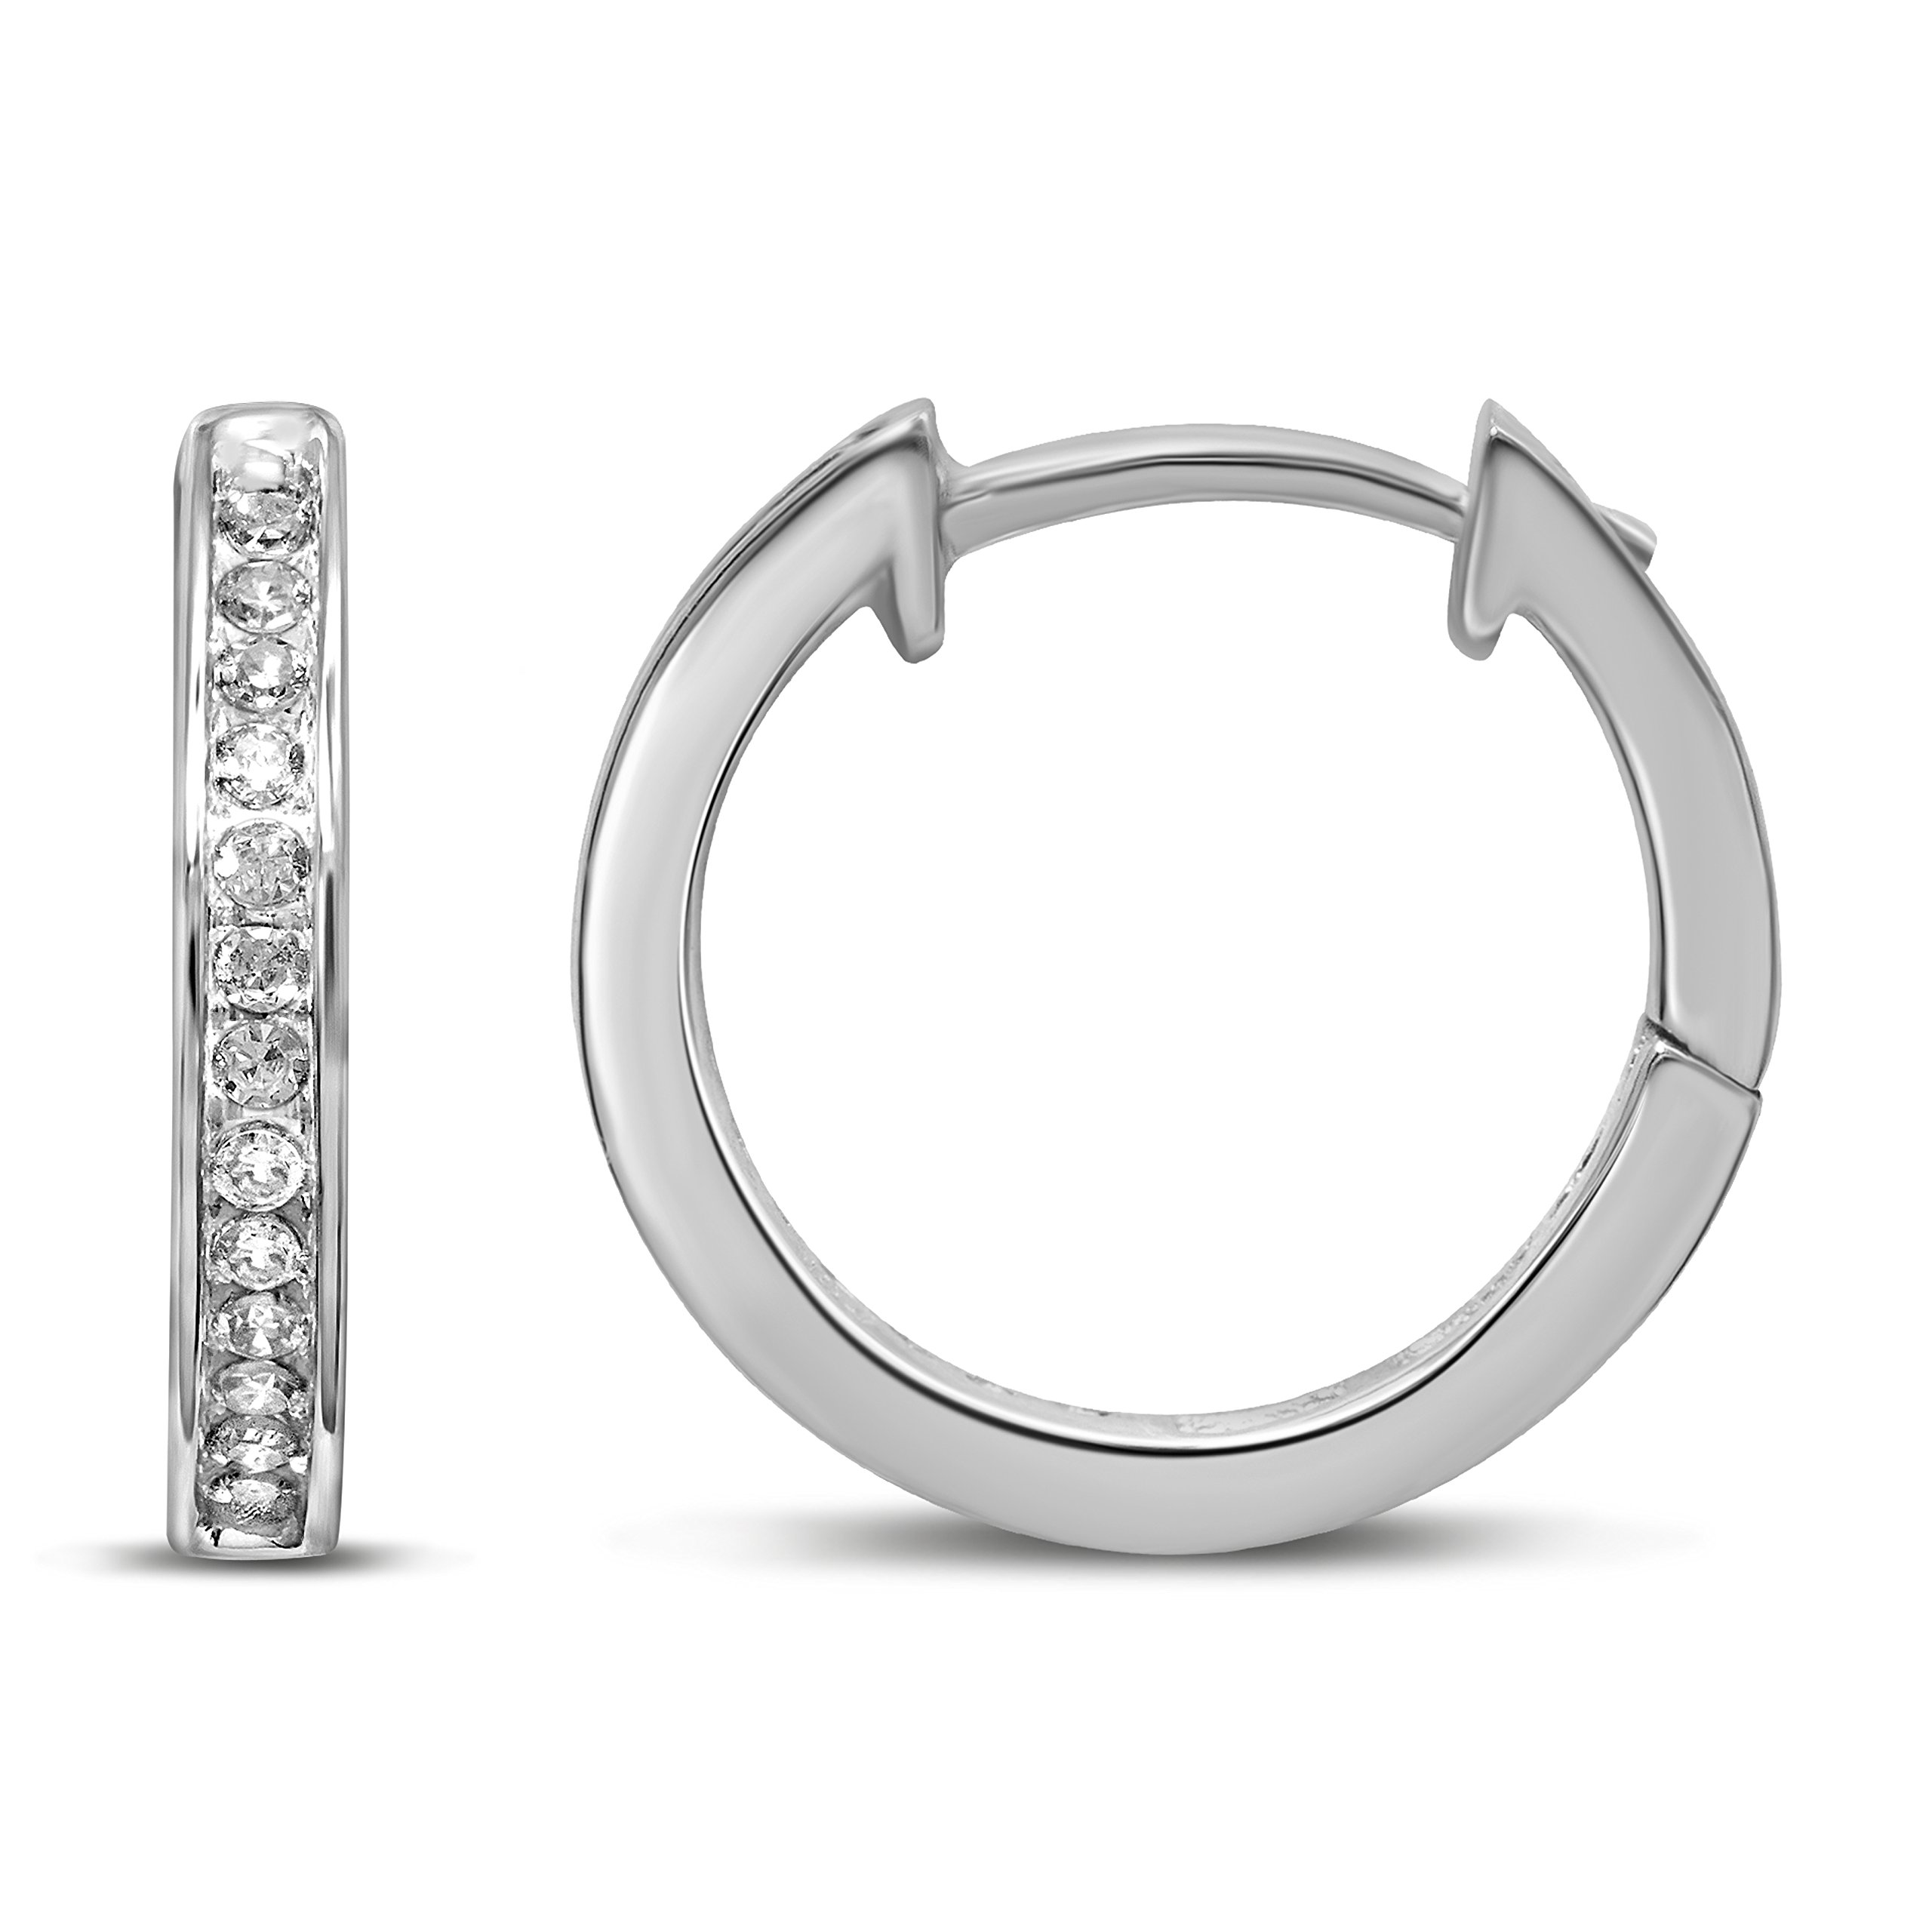 Diamond Jewel 10K White Gold 1/10 cttw Diamond Huggy Hoop Earrings